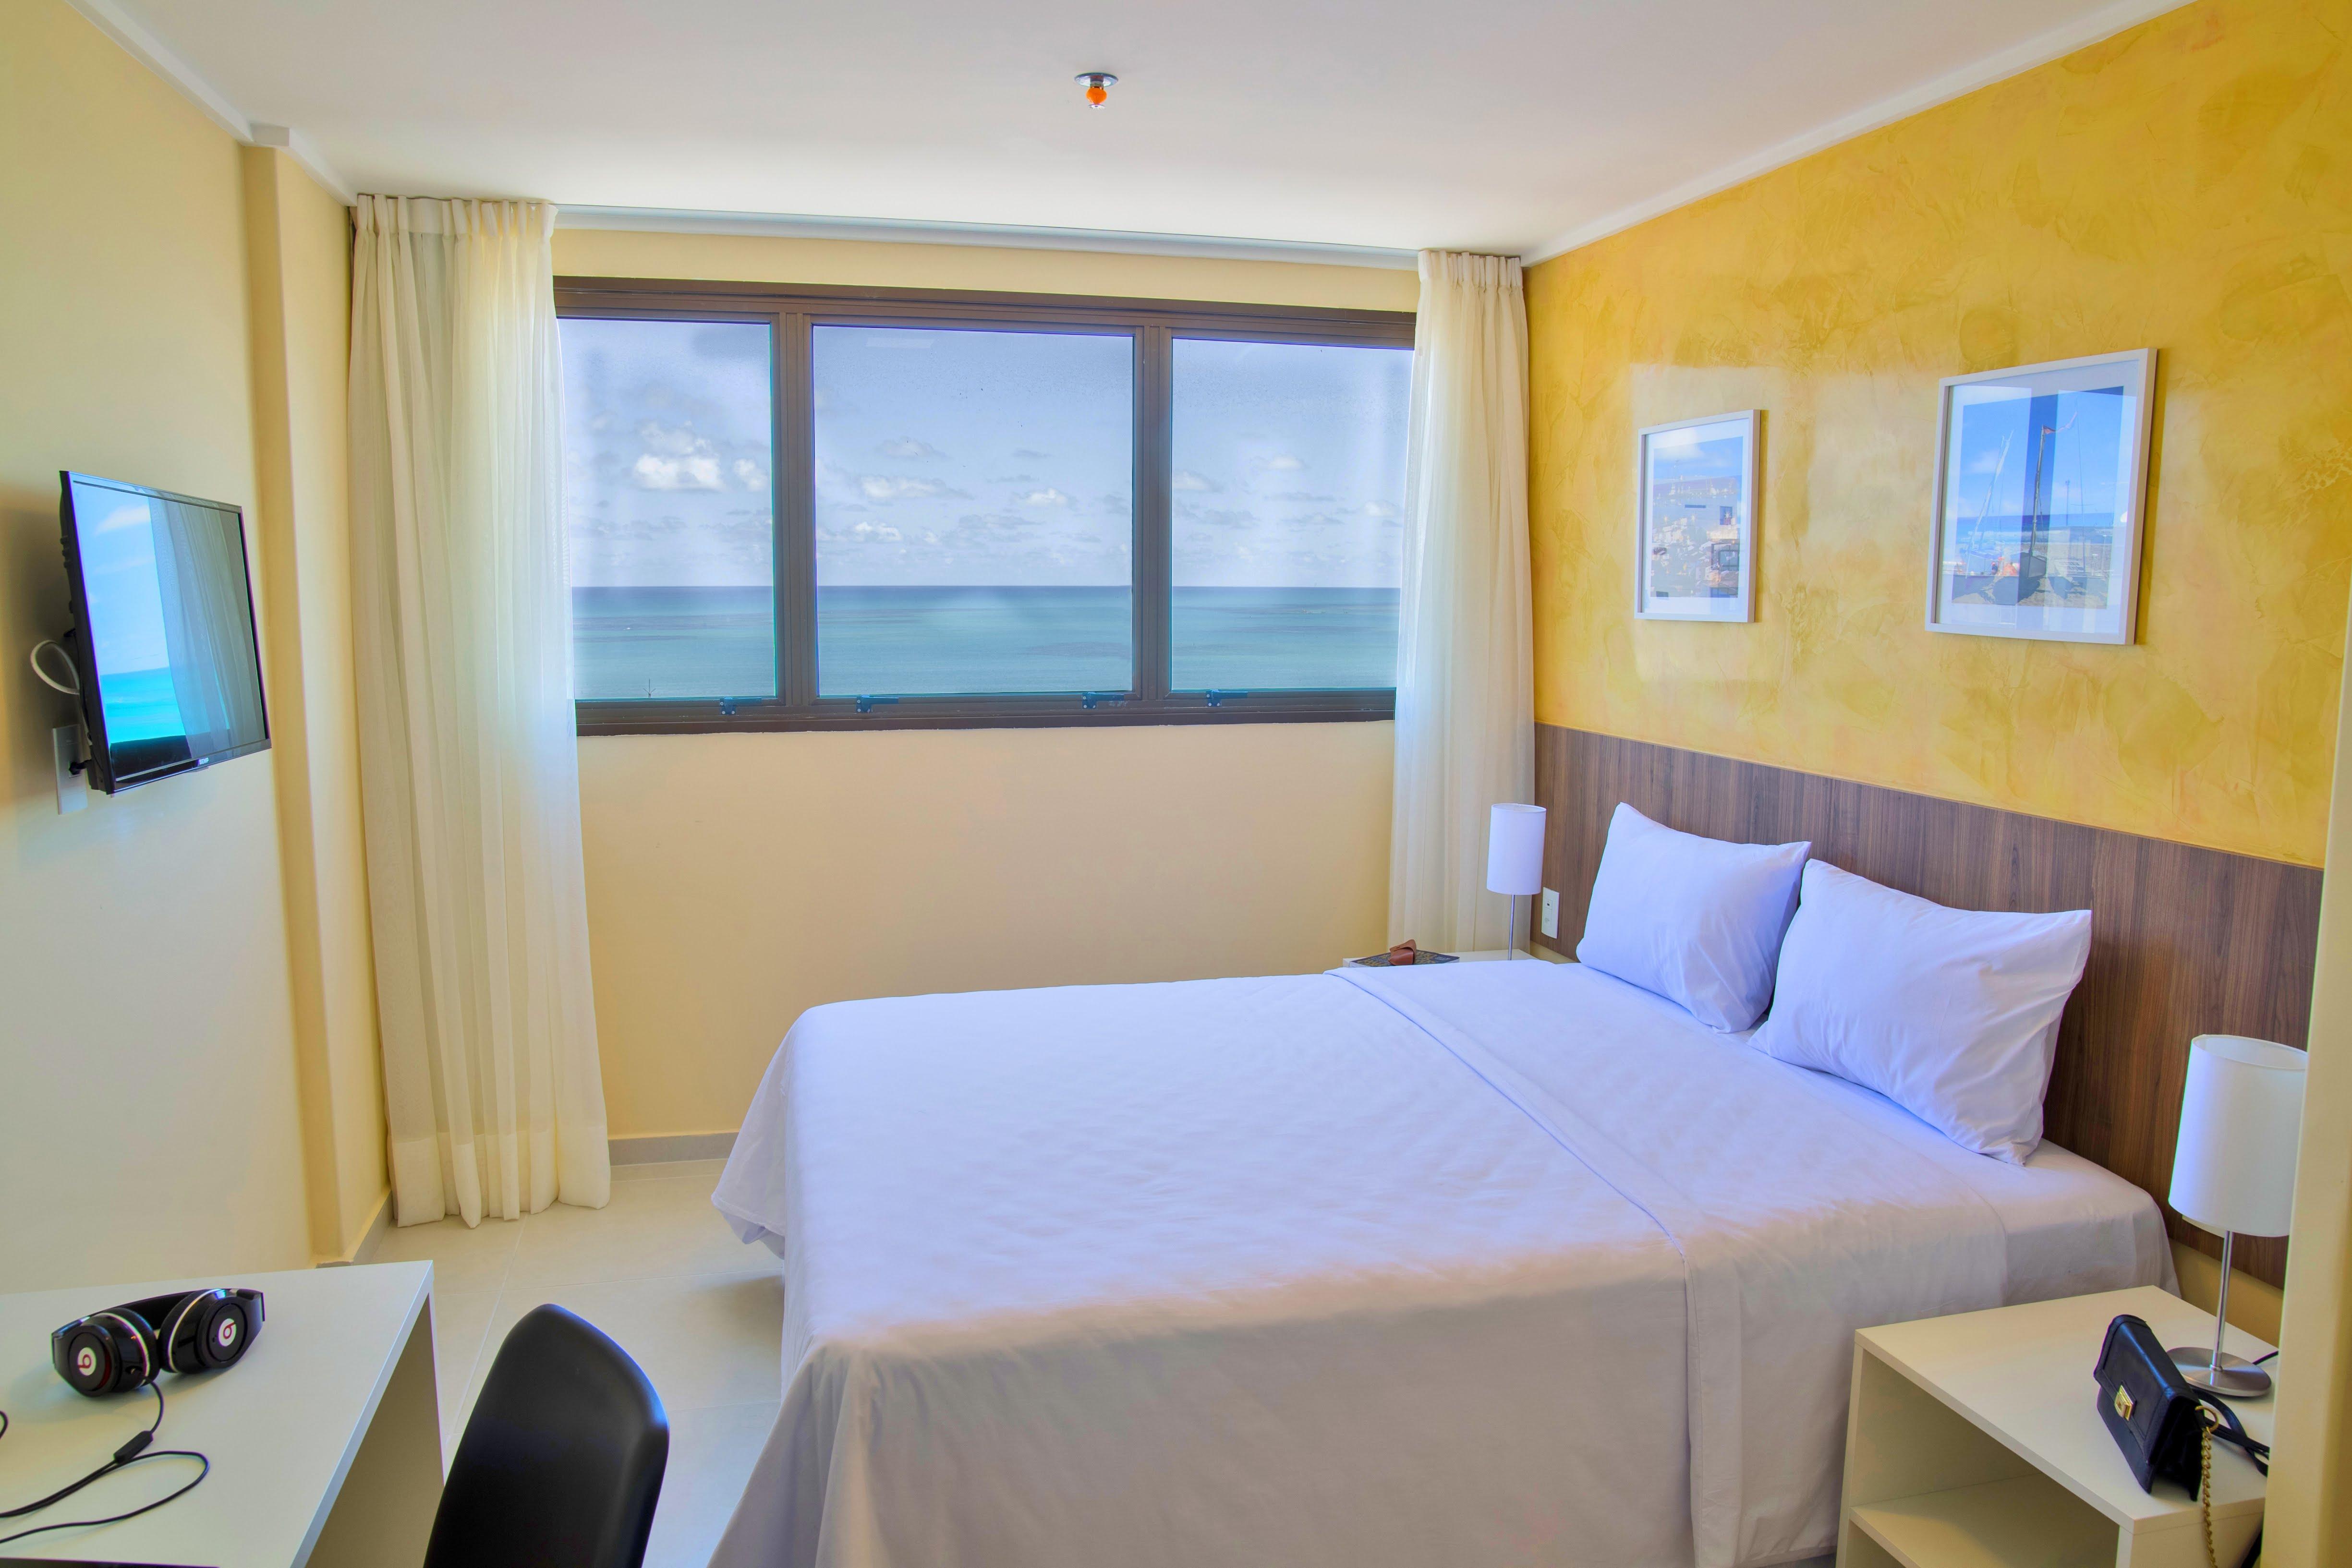 Soft Inn Maceió Ponta Verde